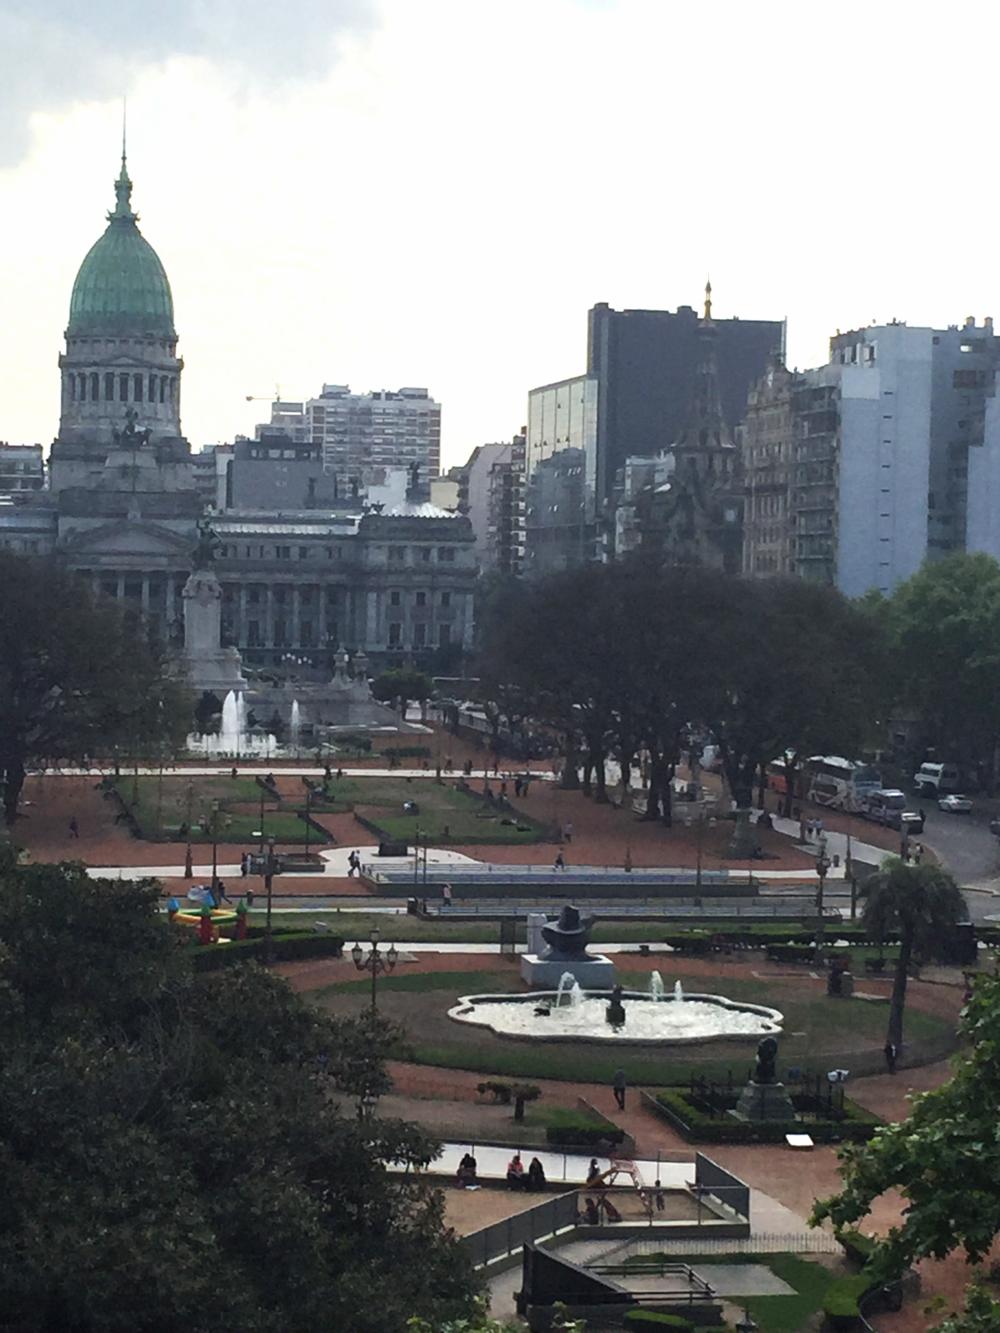 A view across Congreso Plaza from the balcony of Ignacio Liprandi Contemporary Art Gallery